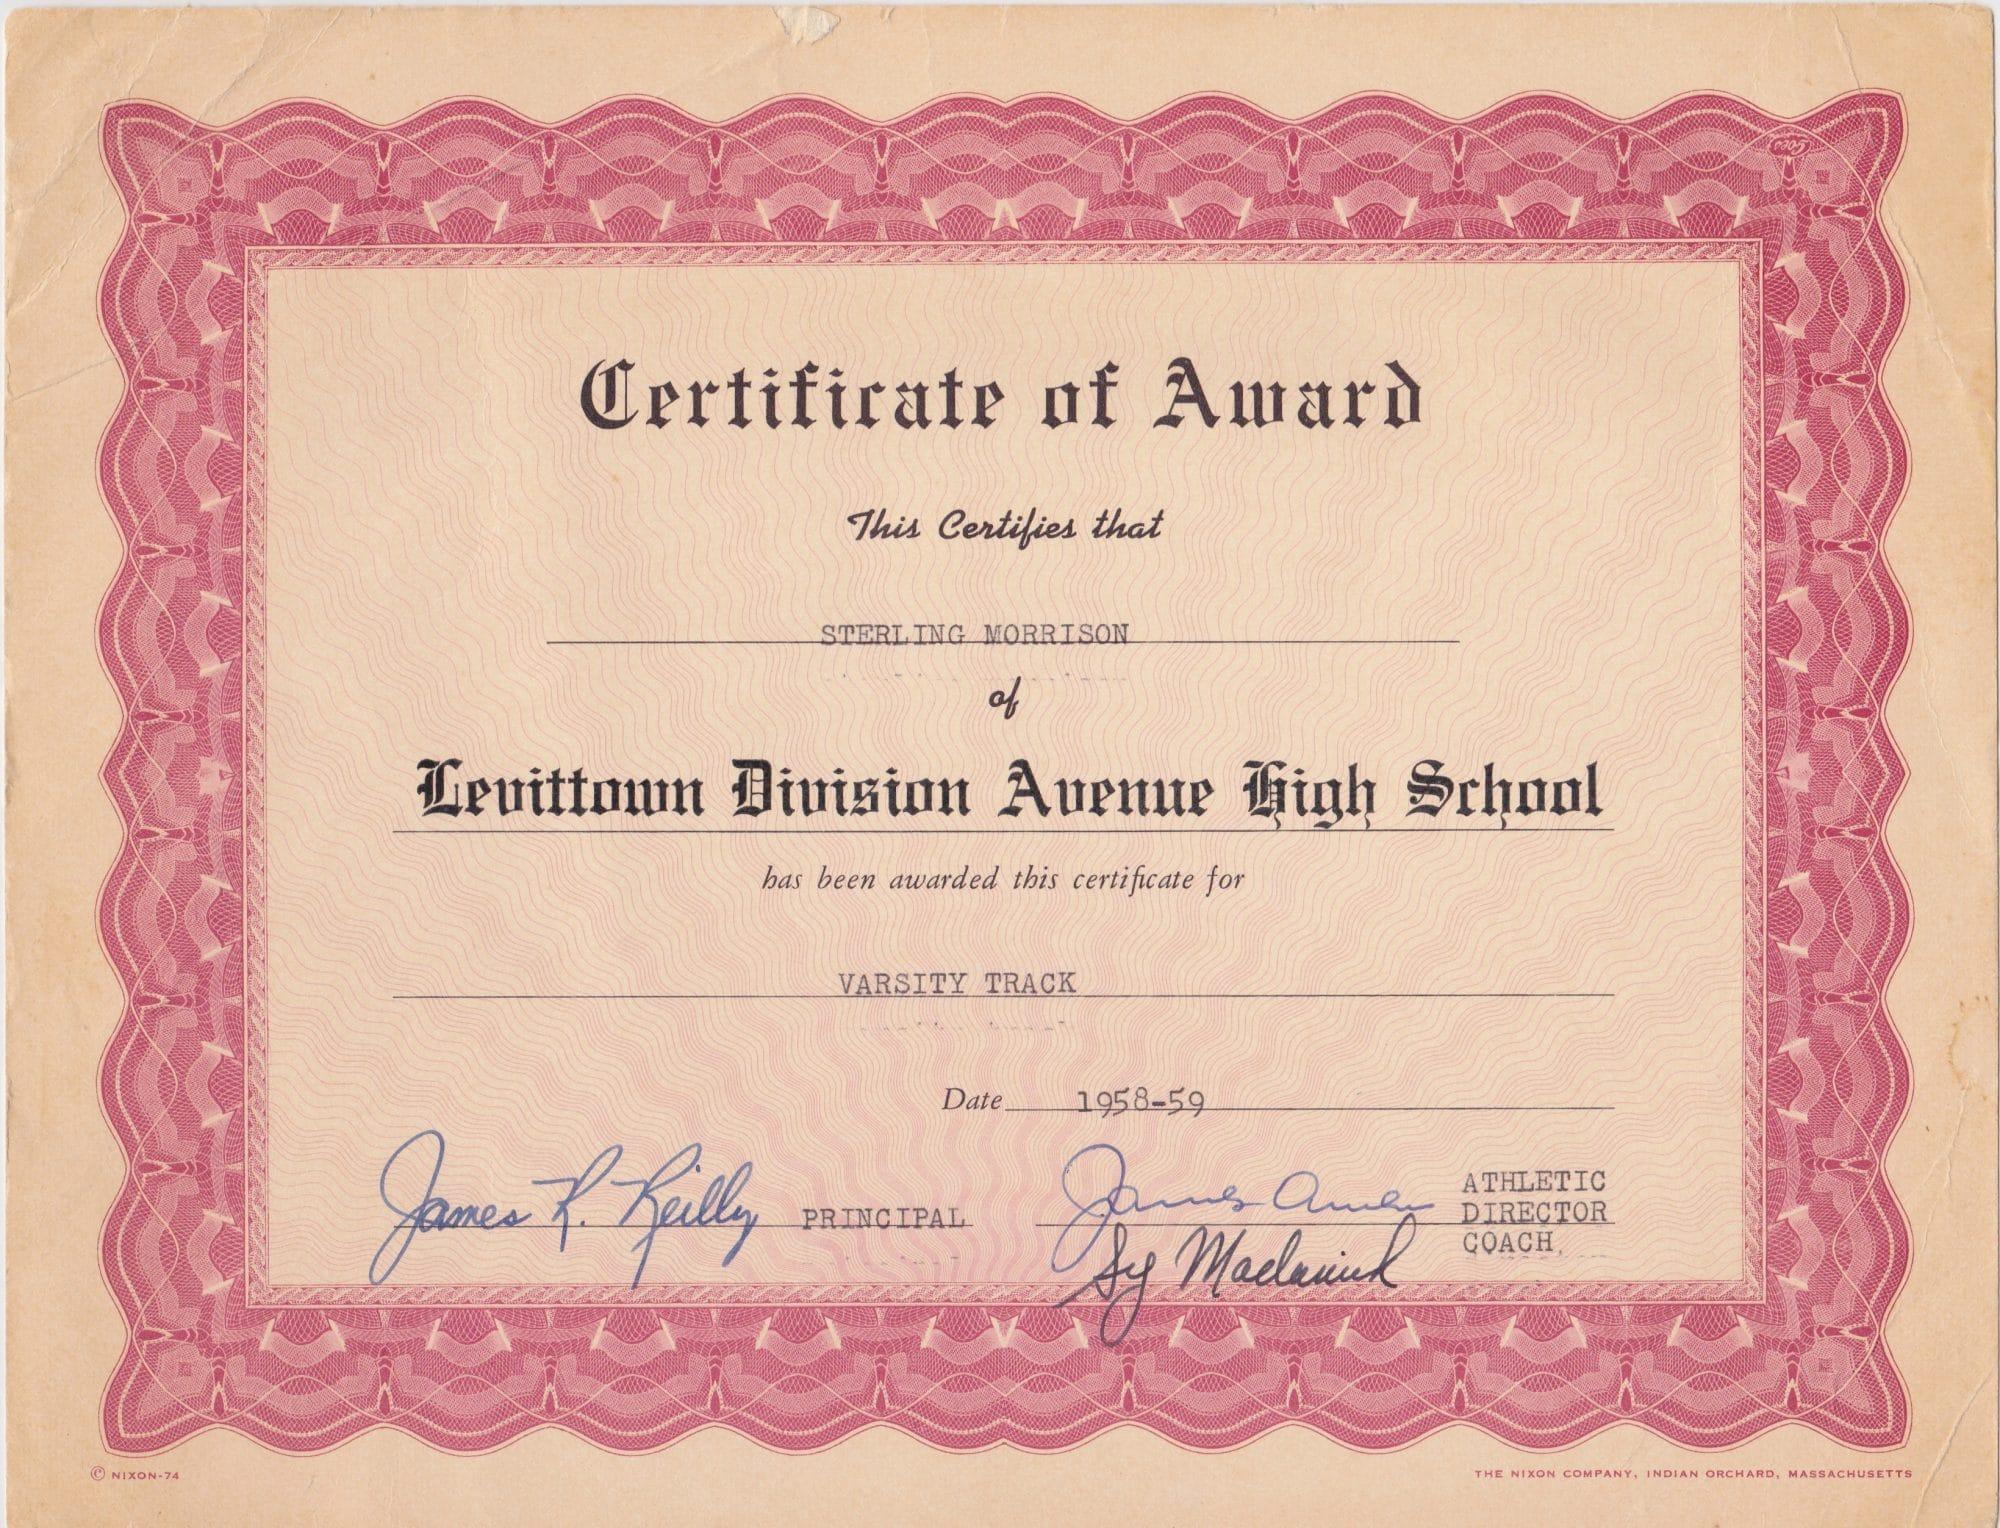 school award certificate  Velvet Underground – Sterling Morrison High School Award Certificate